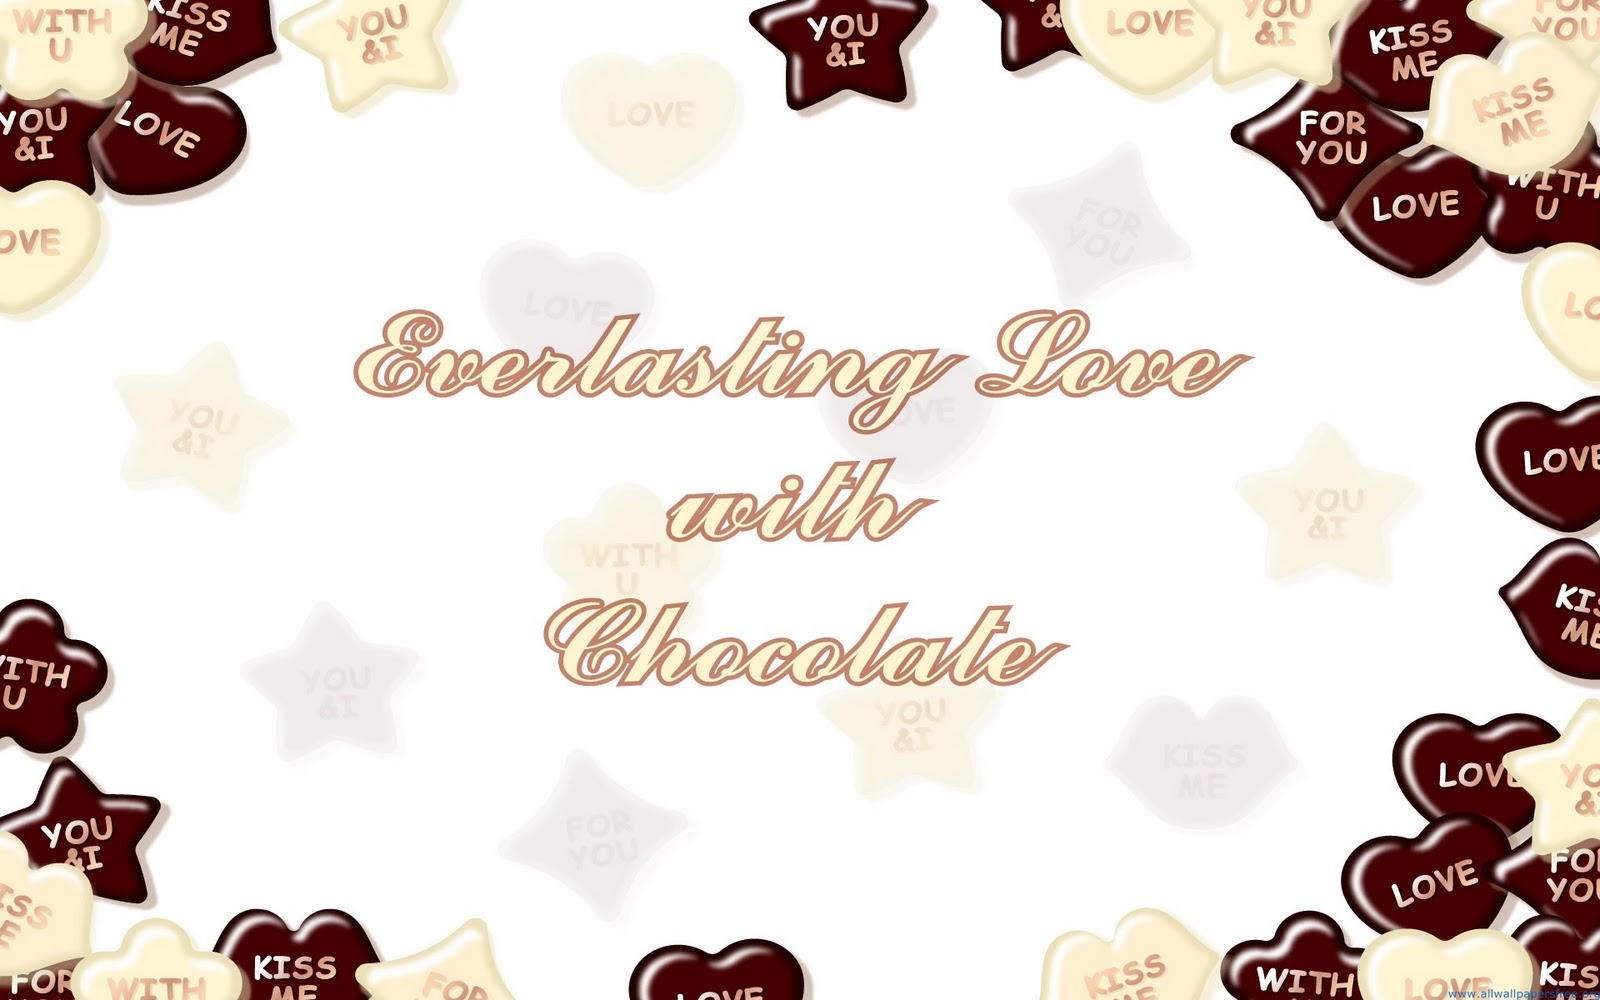 http://4.bp.blogspot.com/-YD8EXdLyAdU/Tyo9yJtfhSI/AAAAAAAABz0/KlnGLHtL4V0/s1600/Beautiful+Valentine%2527s+Day+HD+Widescreen+Wallpapers+%252849%2529.jpg